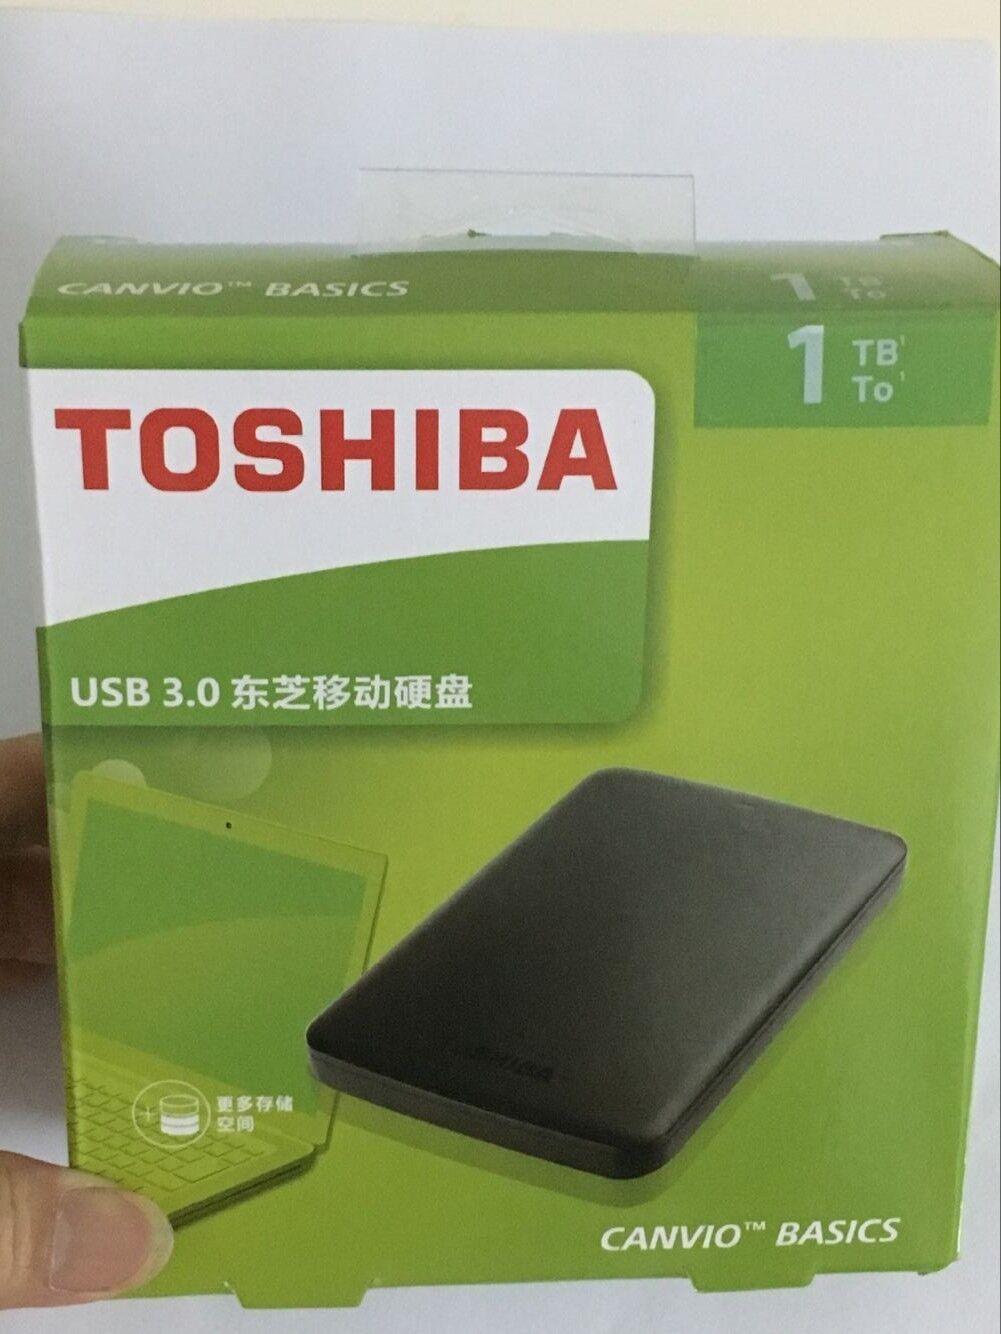 Toshiba Canvio Basics 1tb Usb30 Portable External Hard Disk Drive Hardisk Norton Secured Powered By Verisign